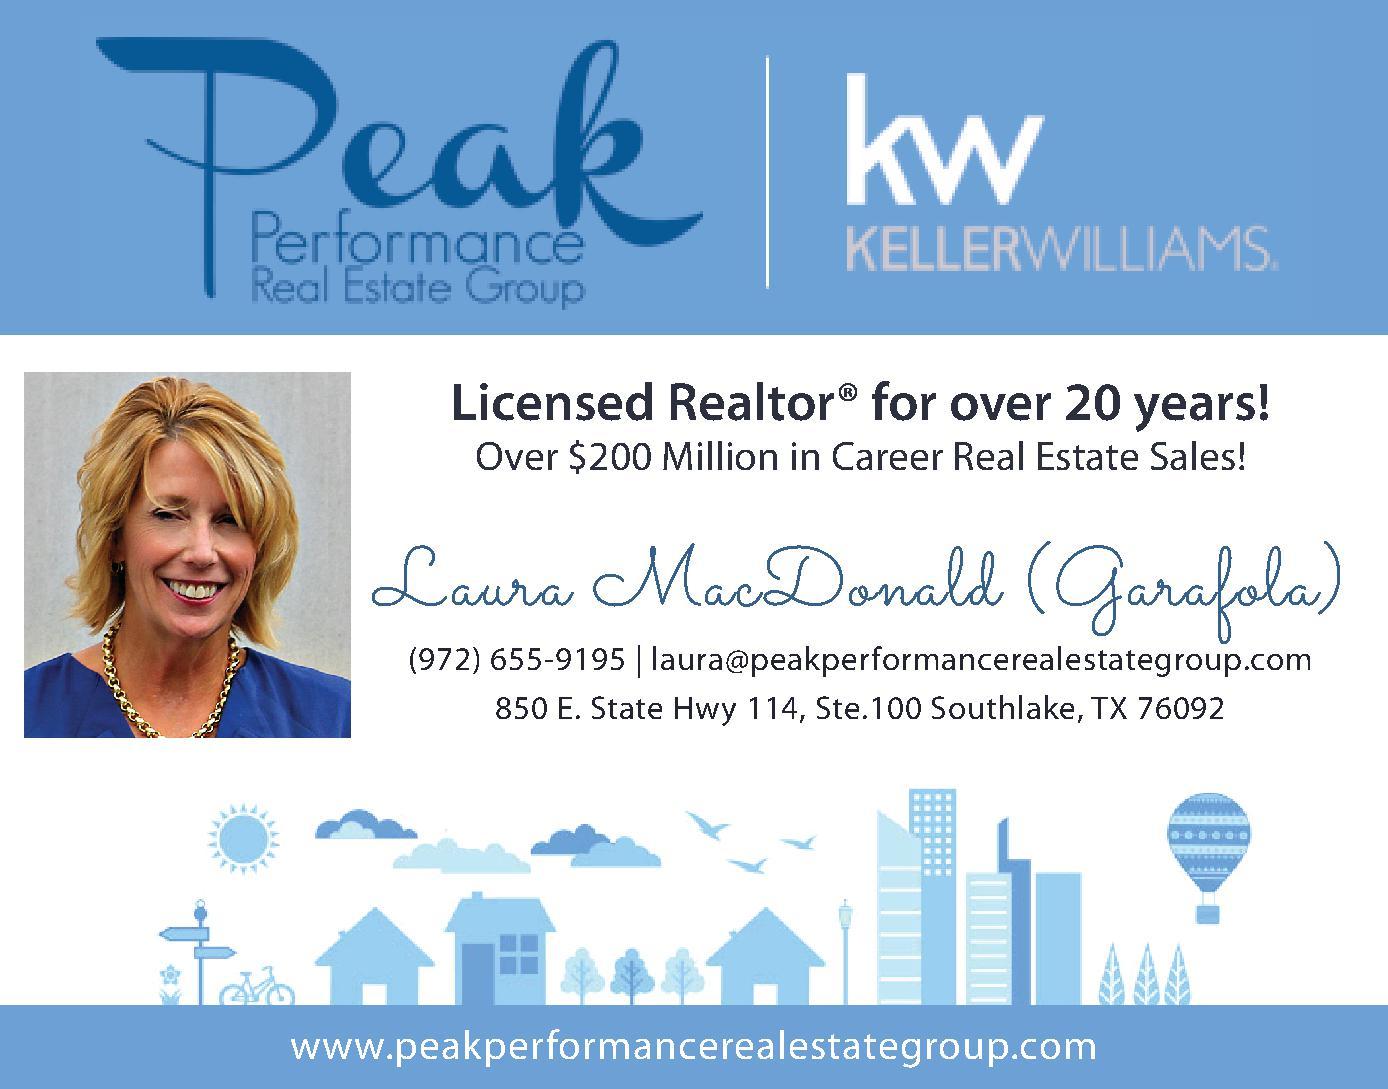 Peak Performance Real Estate Group w/KW